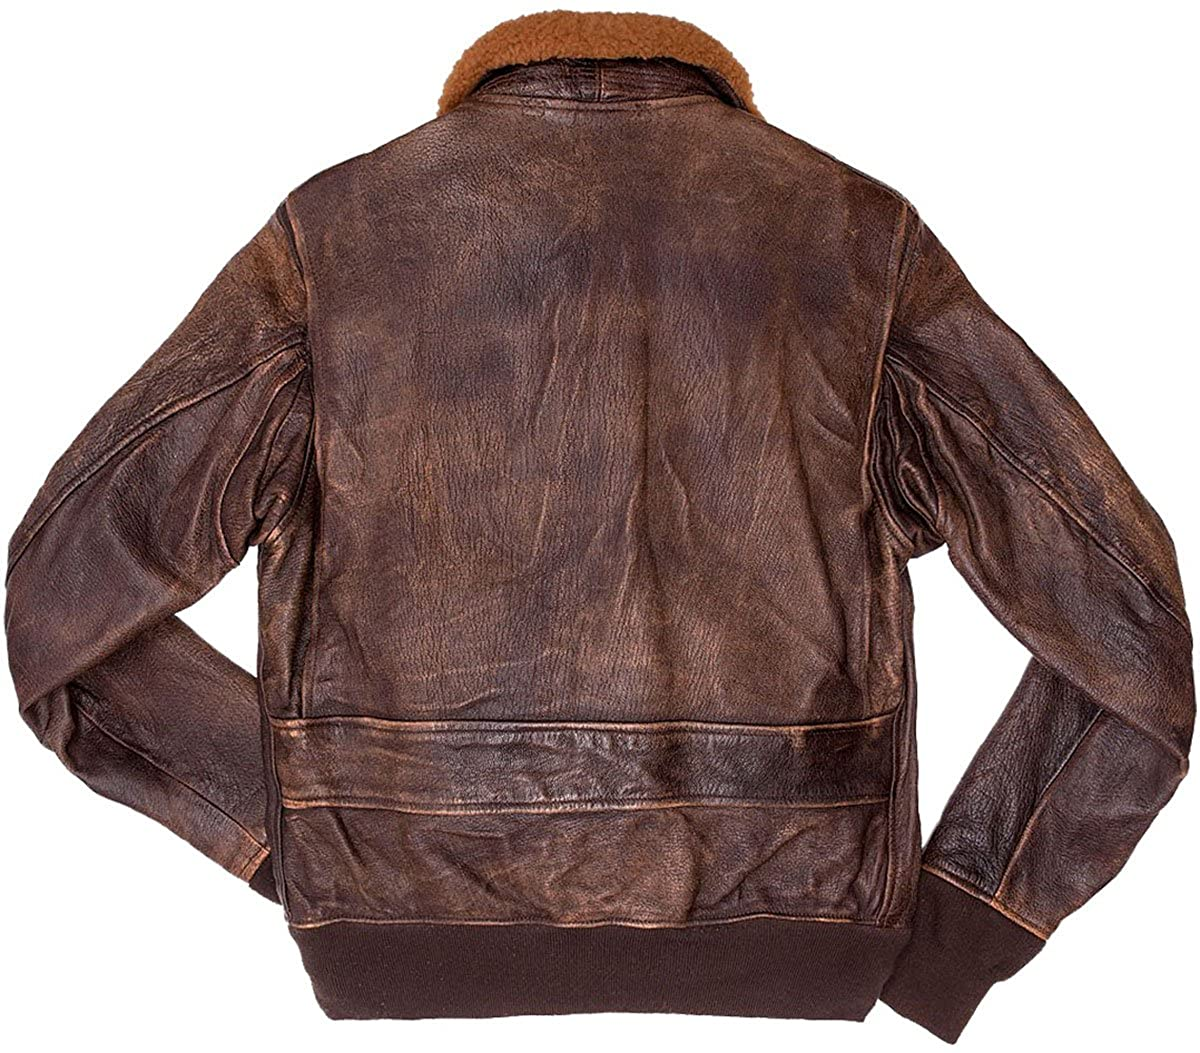 Amazon.com: III-Fashions G1 - Chaqueta de piel para hombre ...